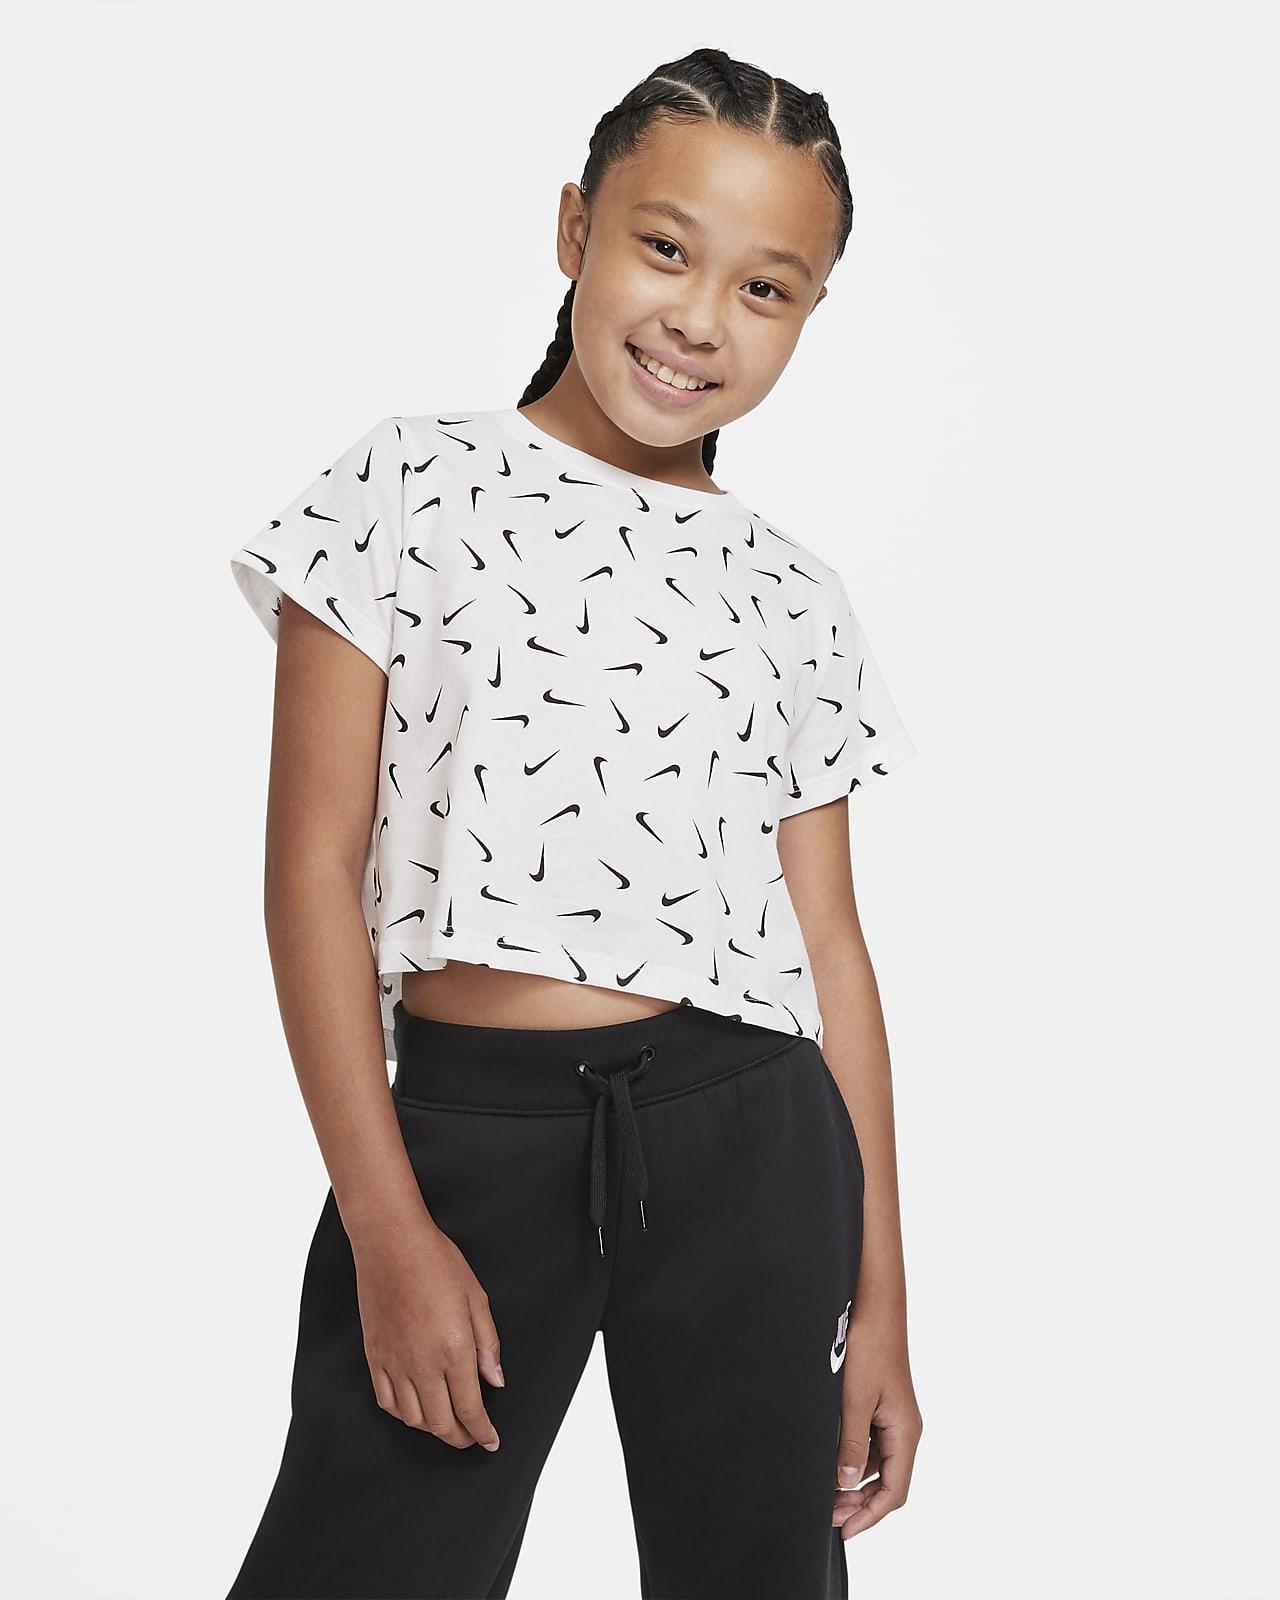 Nike Sportswear Older Kids' (Girls') Cropped T-Shirt